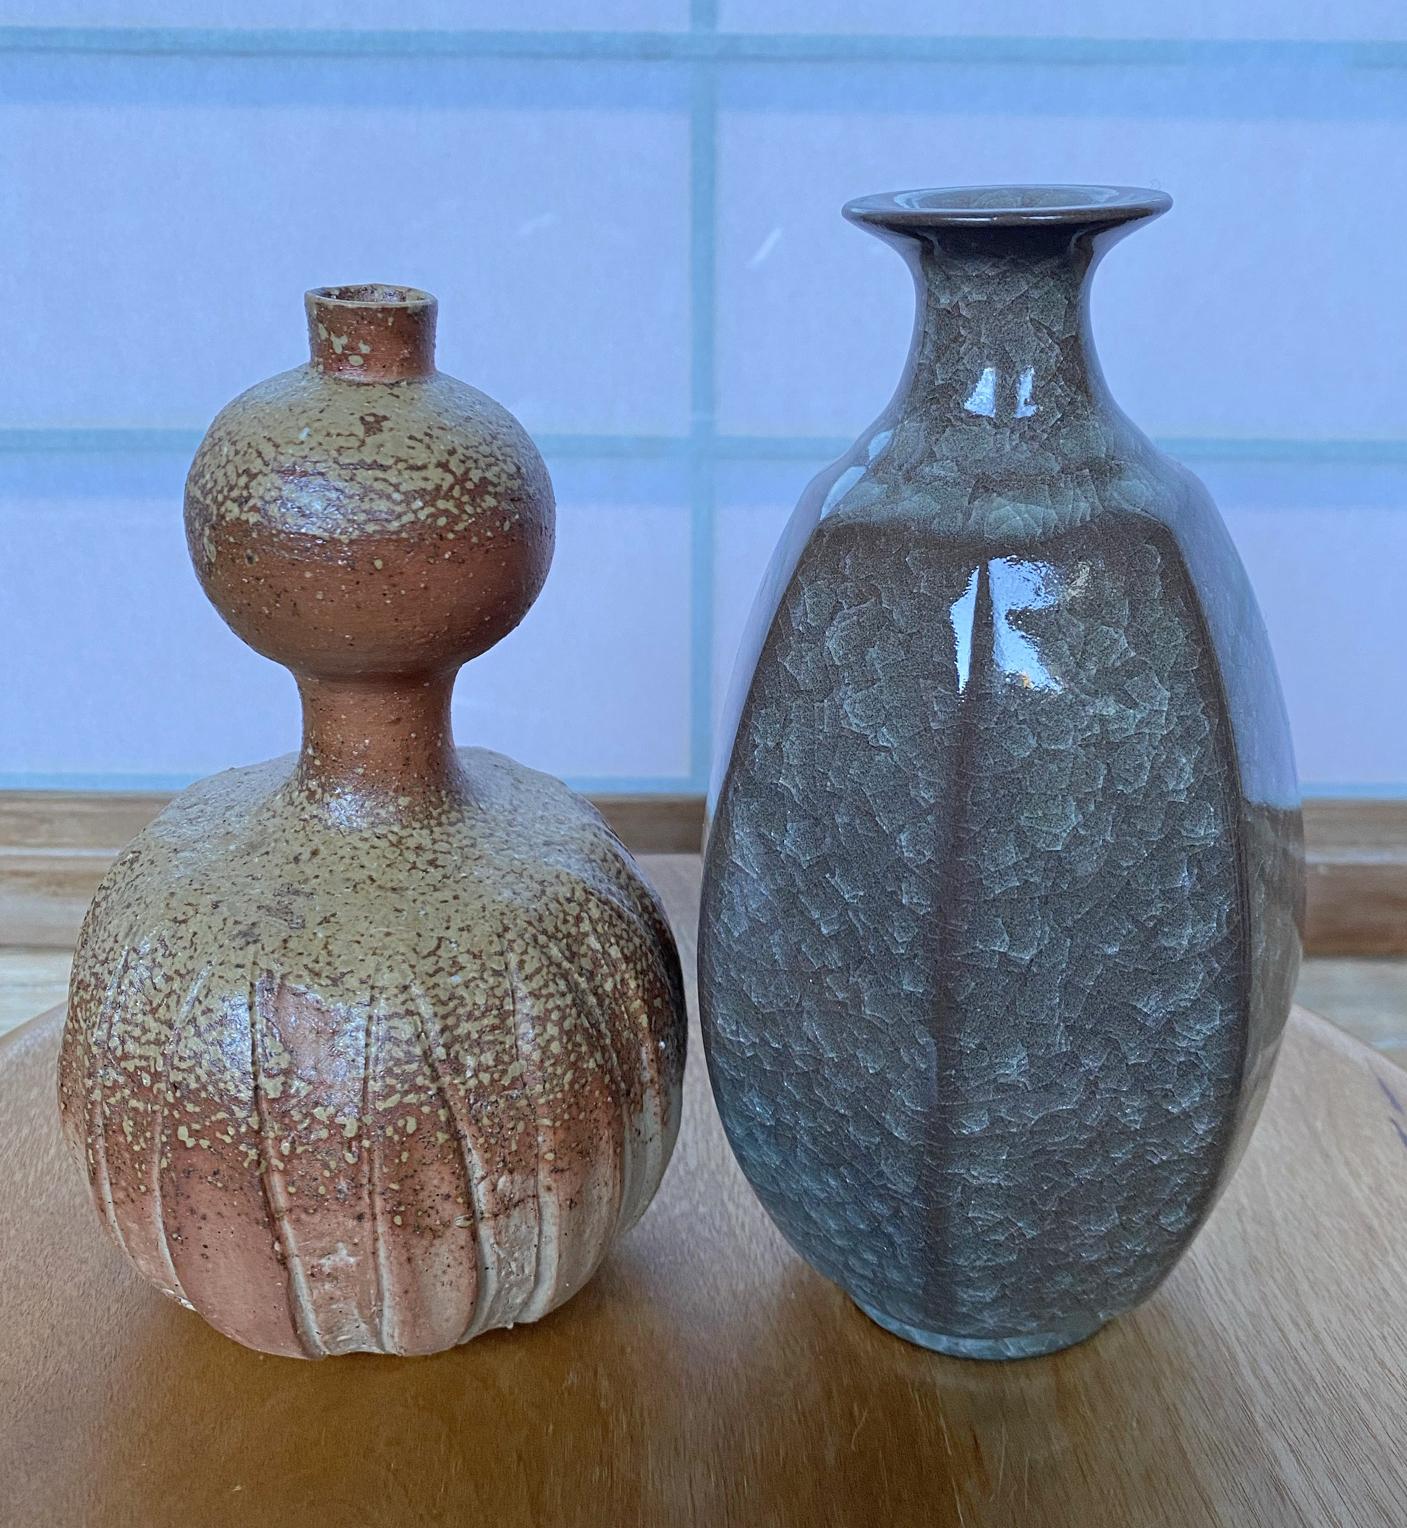 Bizen Mori Togaku/Celadon Minegishi Seiko Flasks